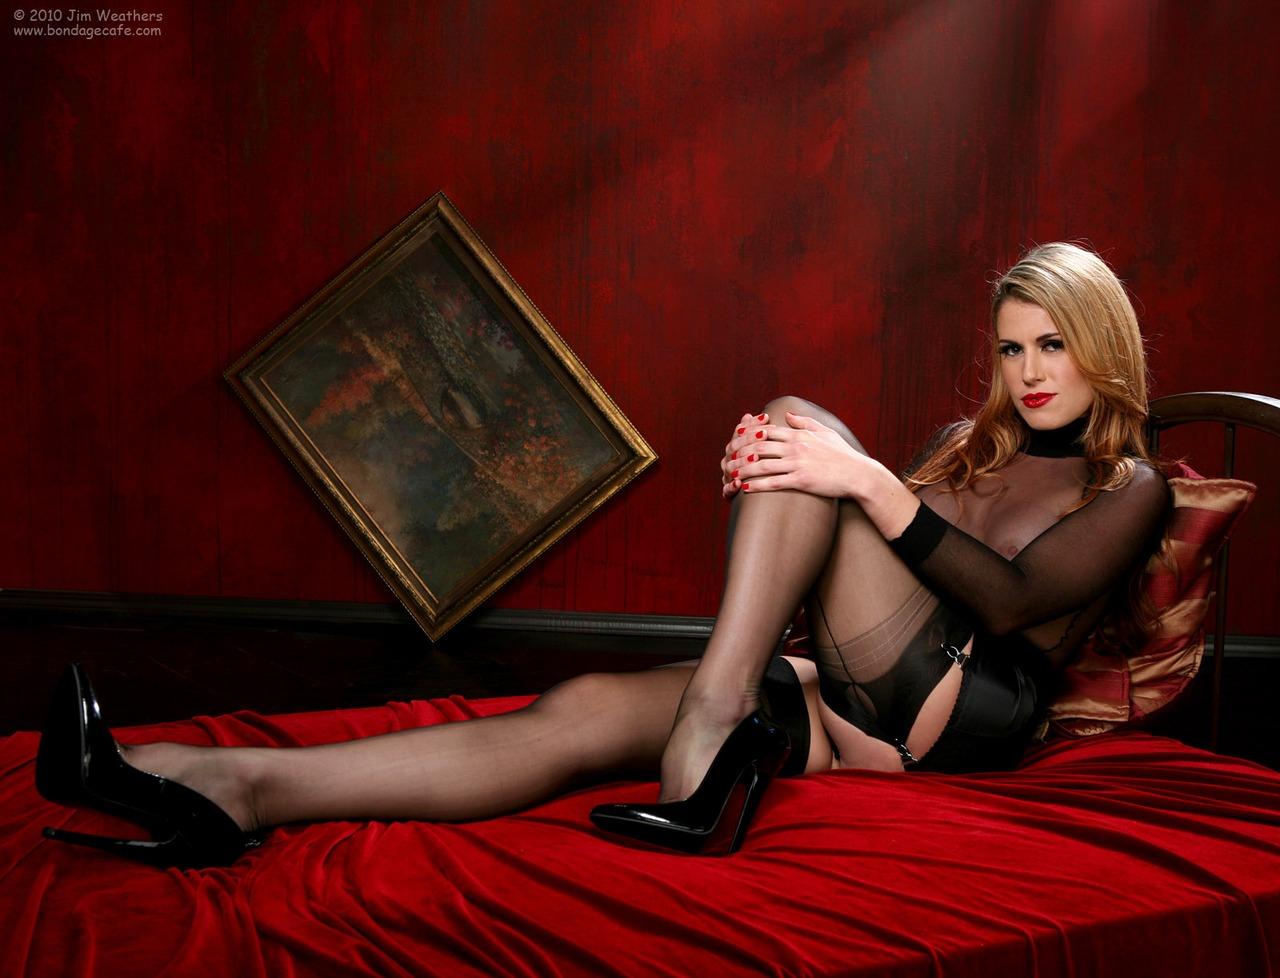 Sm crossed legs pictures femdom